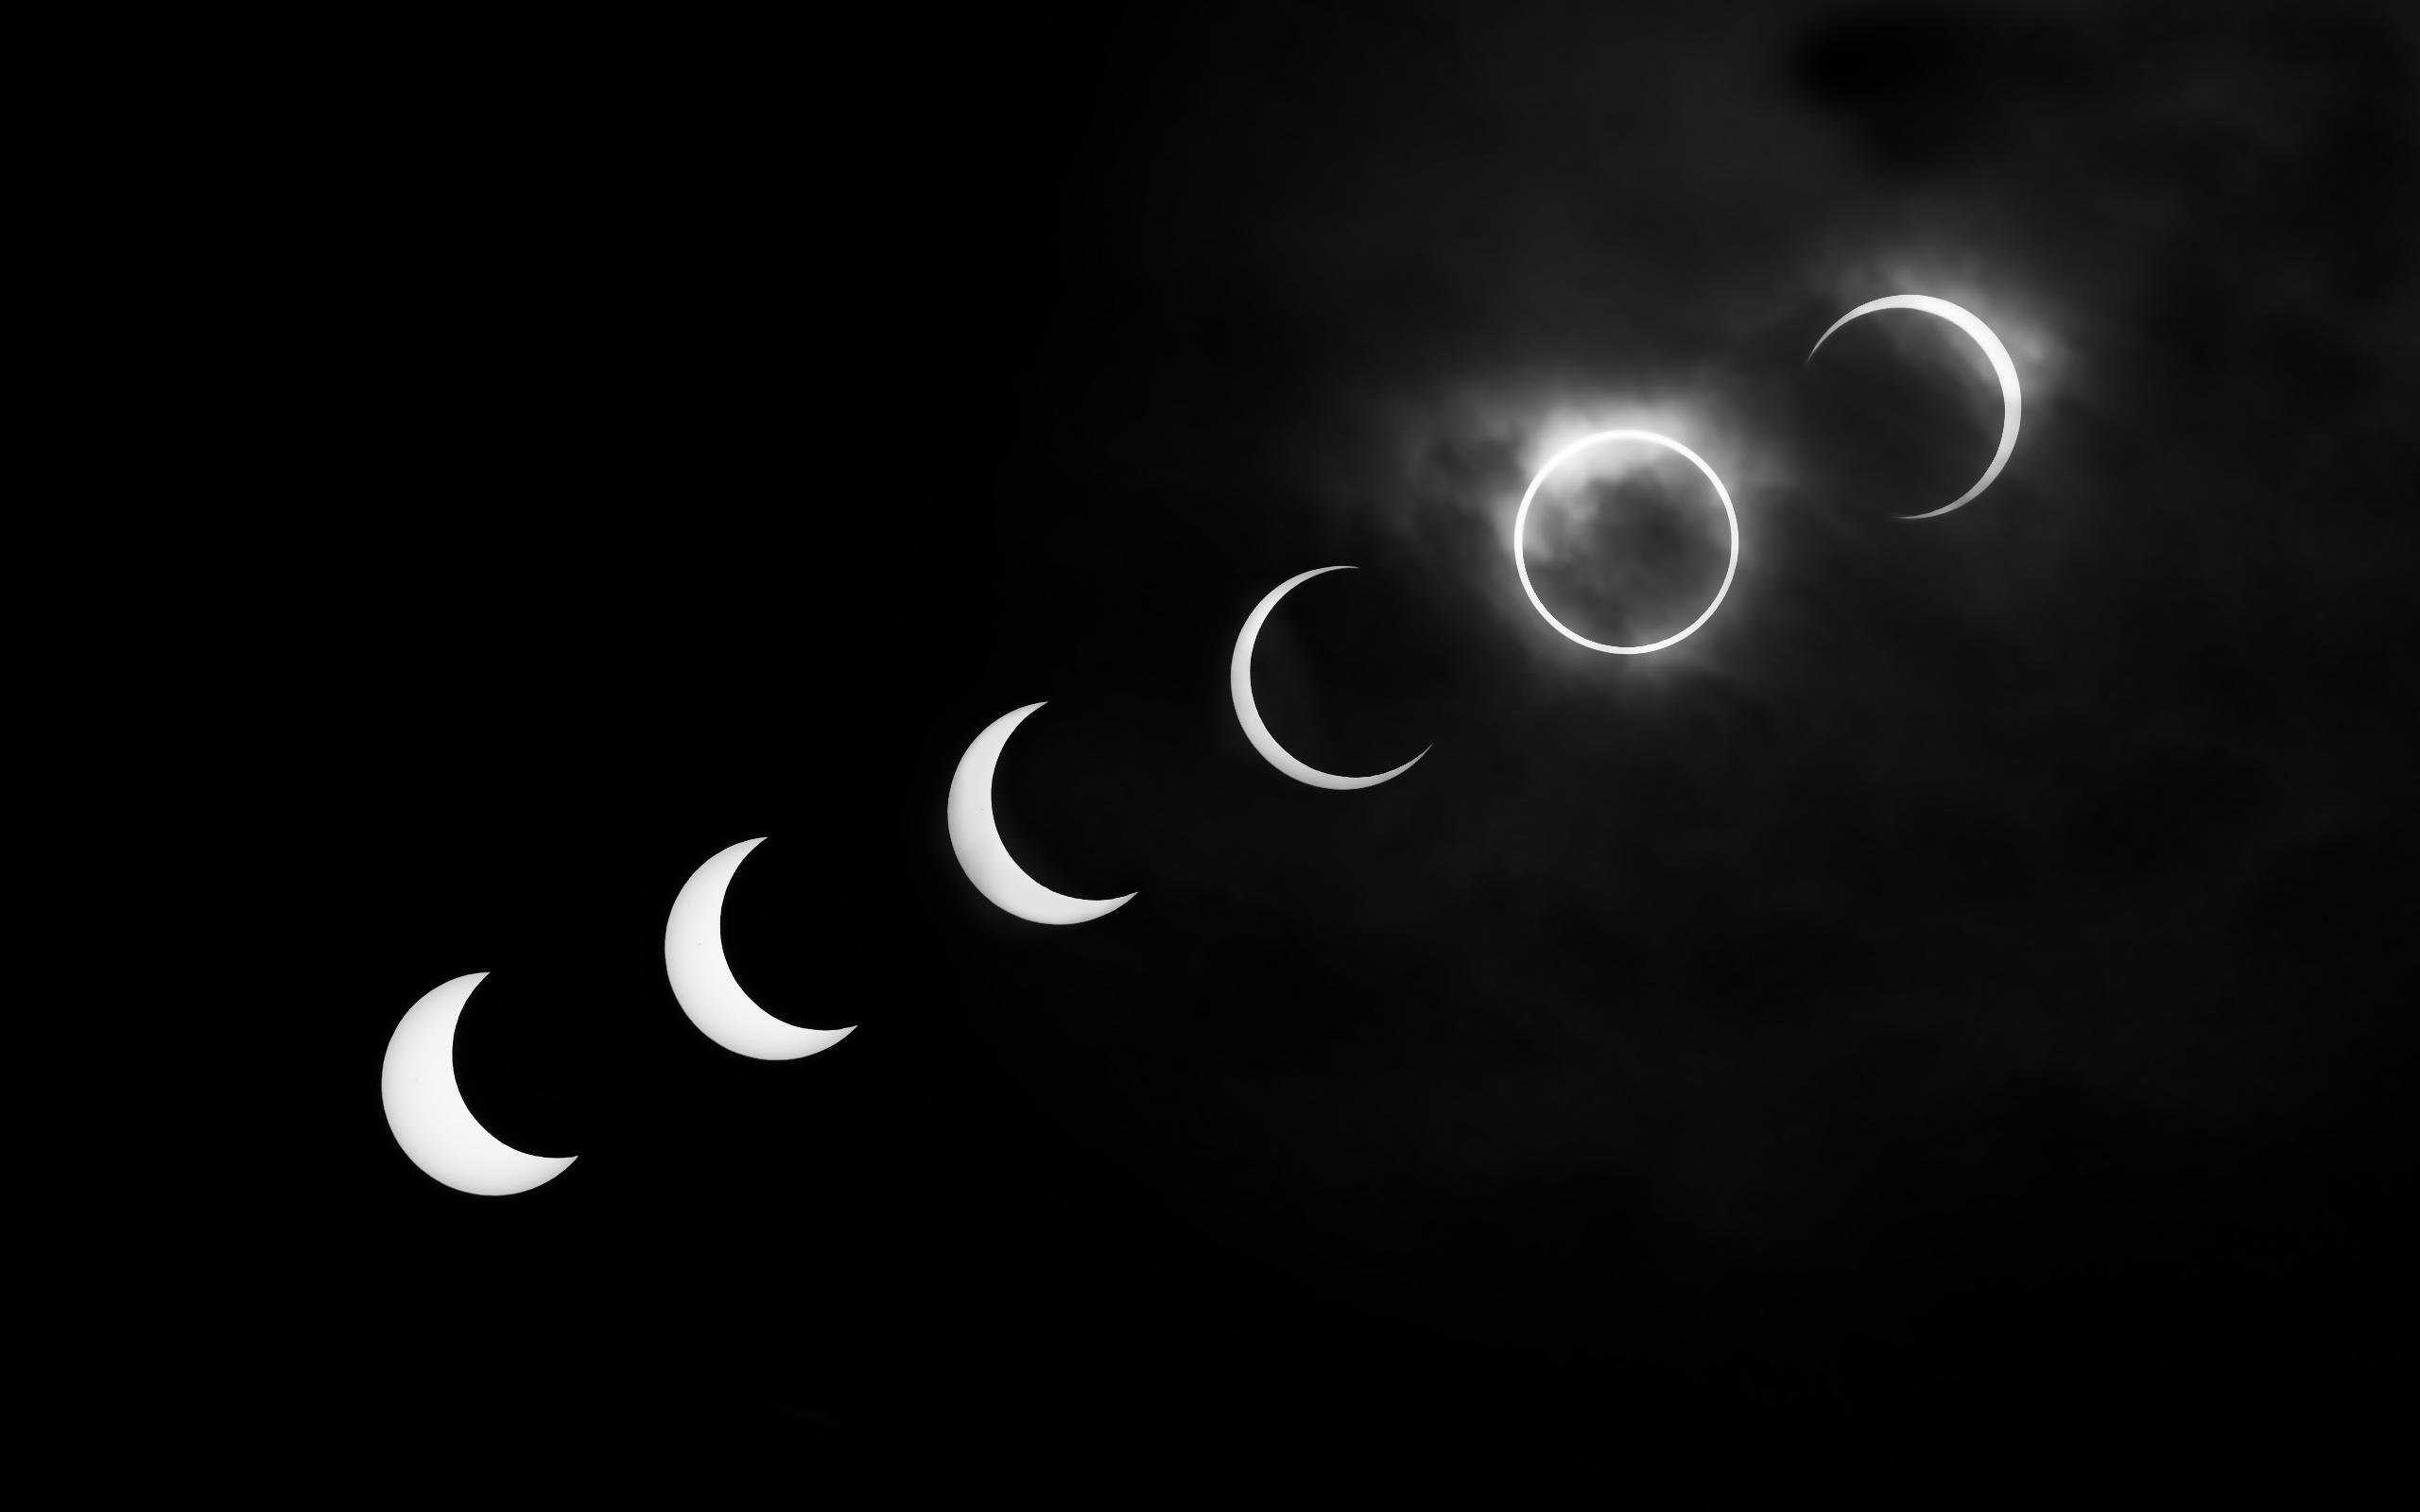 Solar eclipse black and white desktop wallpaper Black 2560x1600